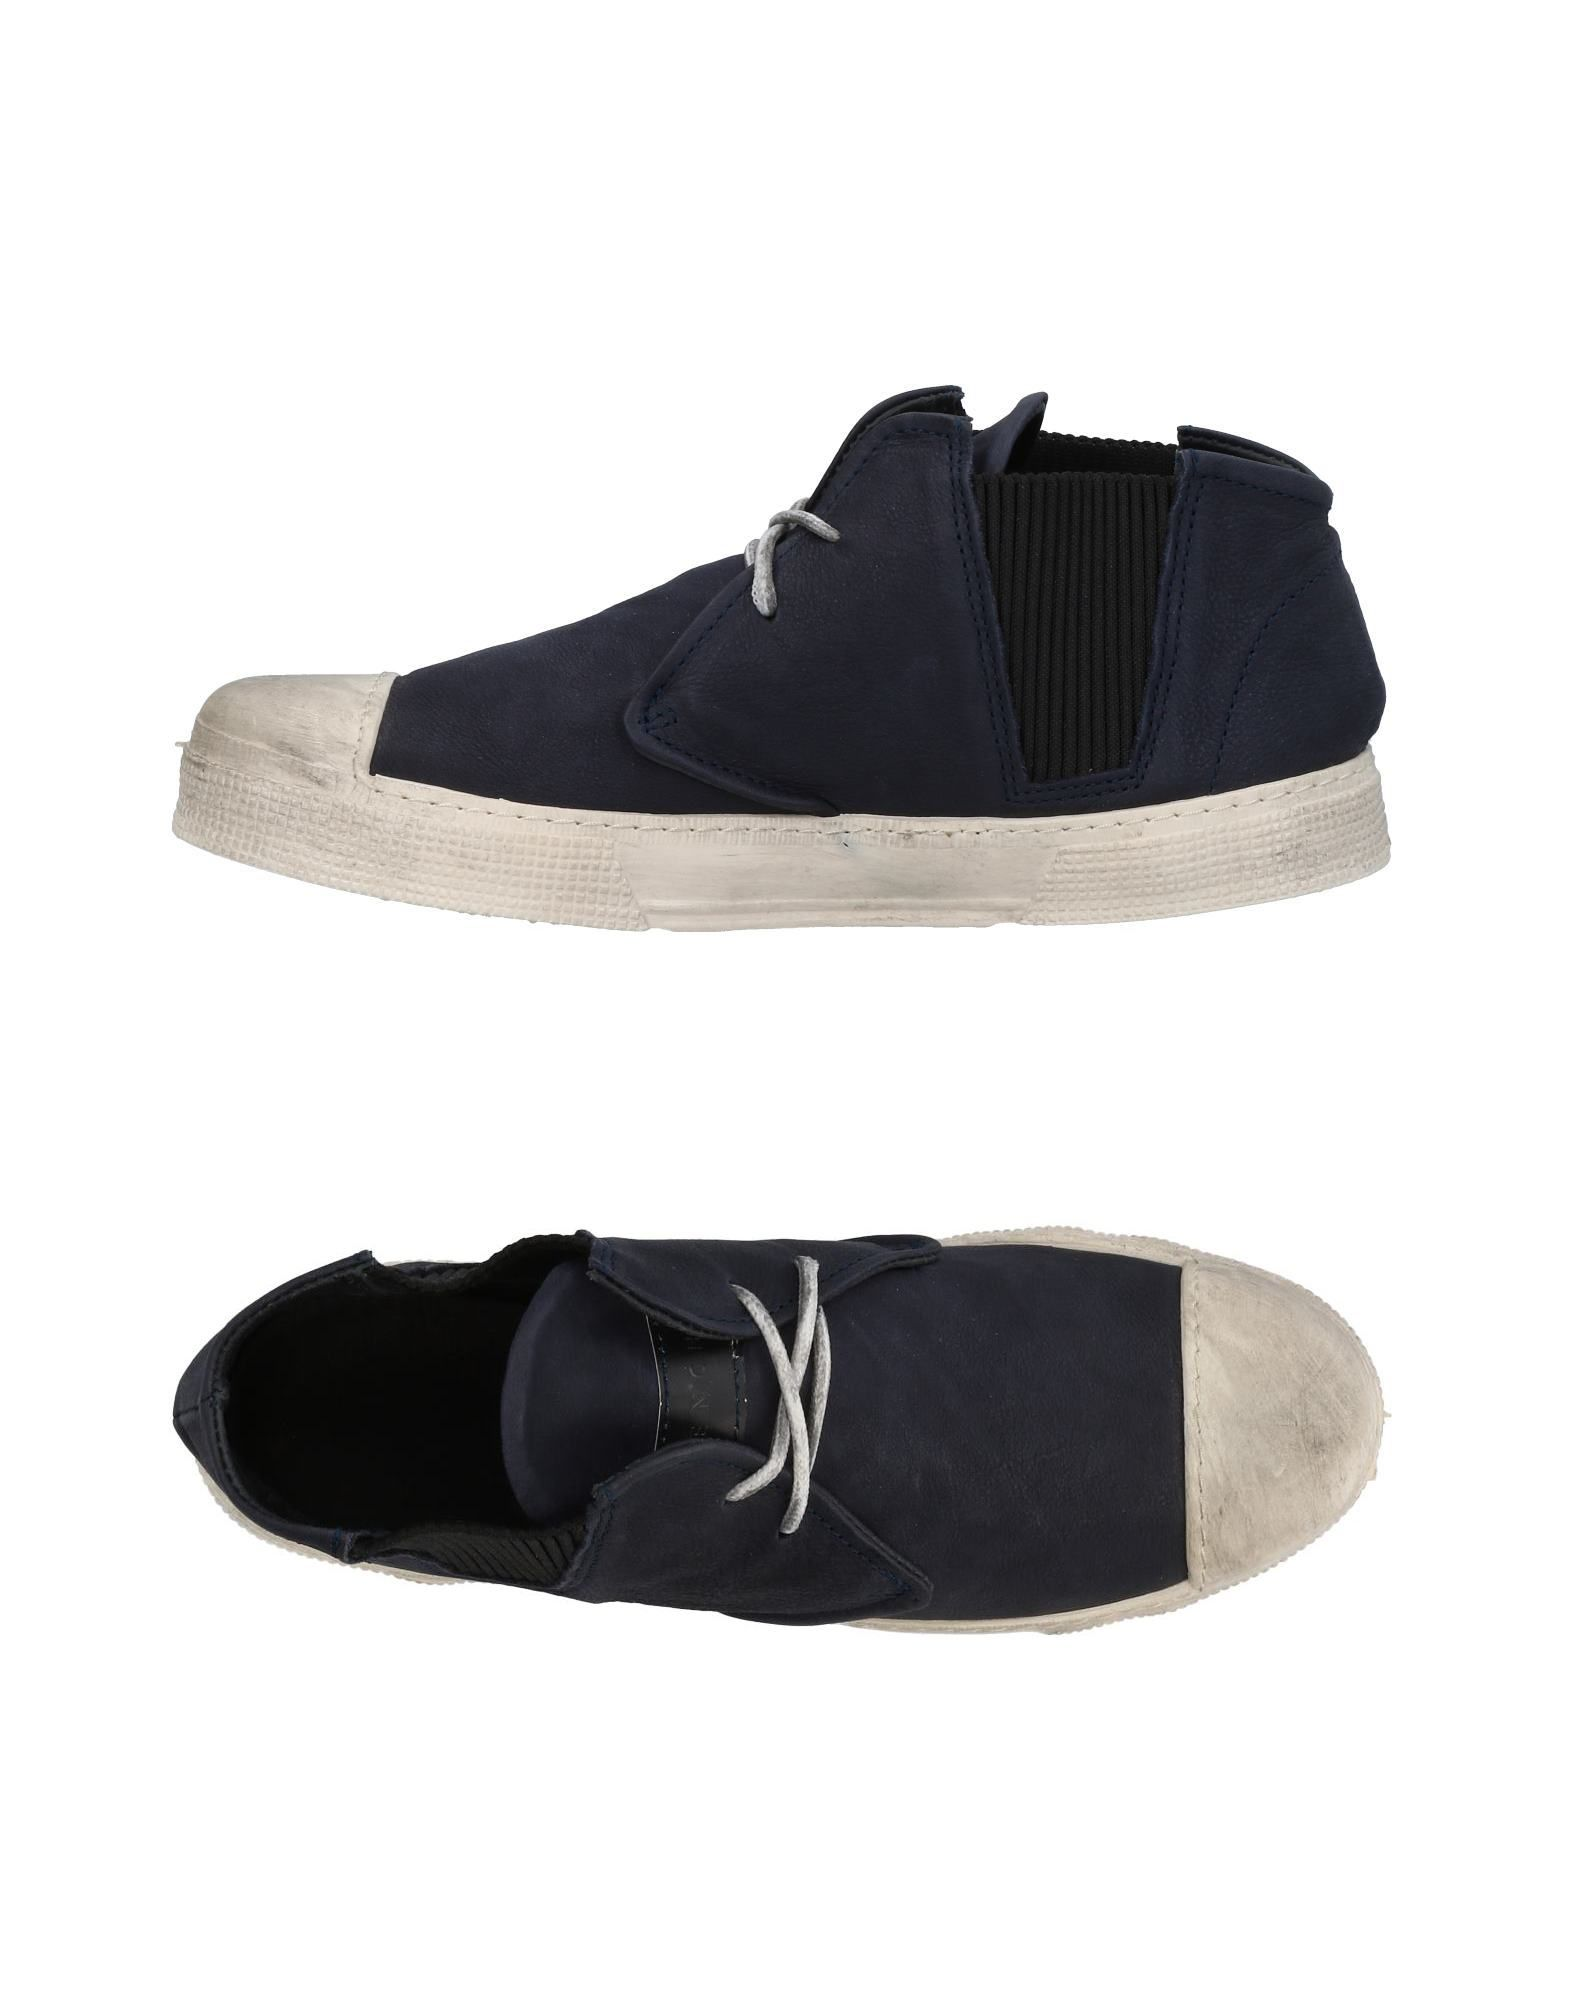 Sneakers Gienchi Uomo - Acquista online su